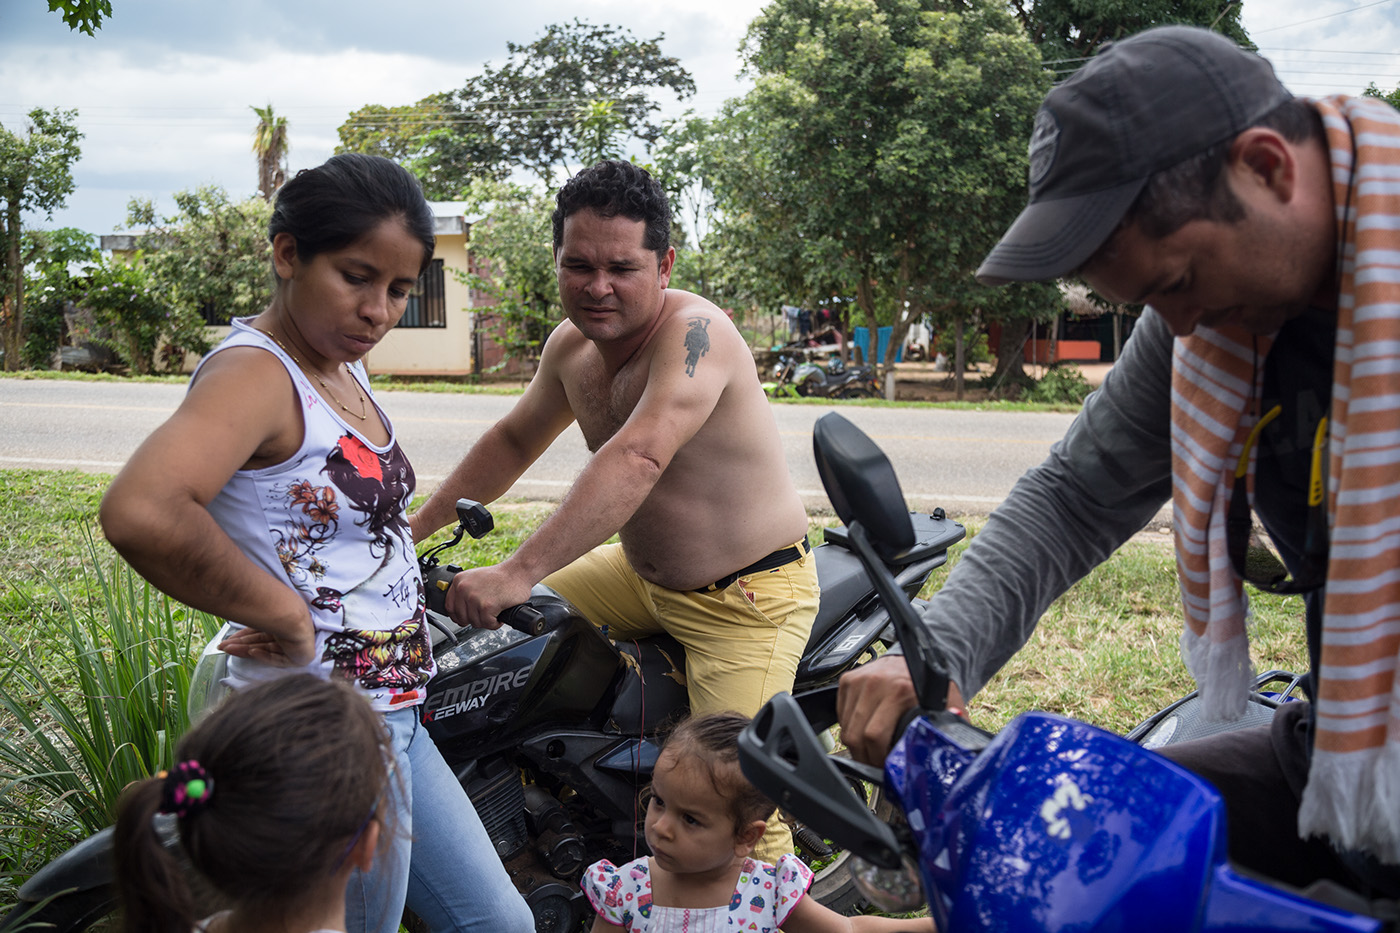 llano colombia Arauca  ELN casanare llanero chimo Cockfight rabo de toro